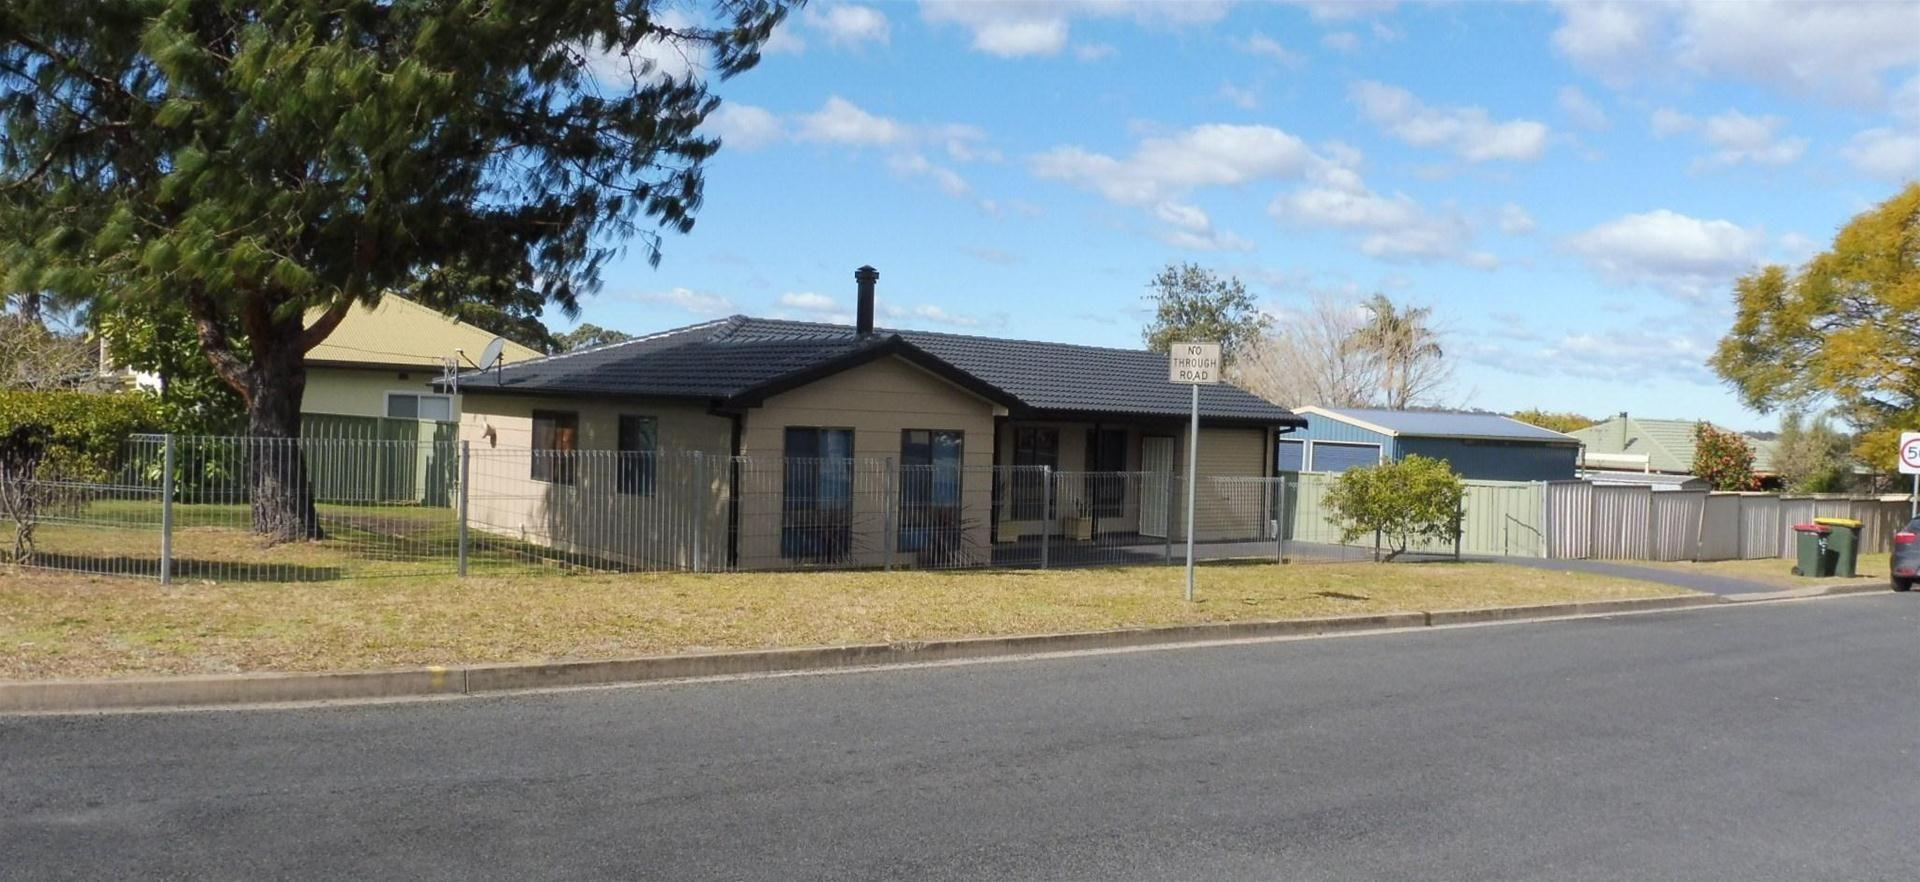 144 McMahons Road, North Nowra NSW 2541, Image 1